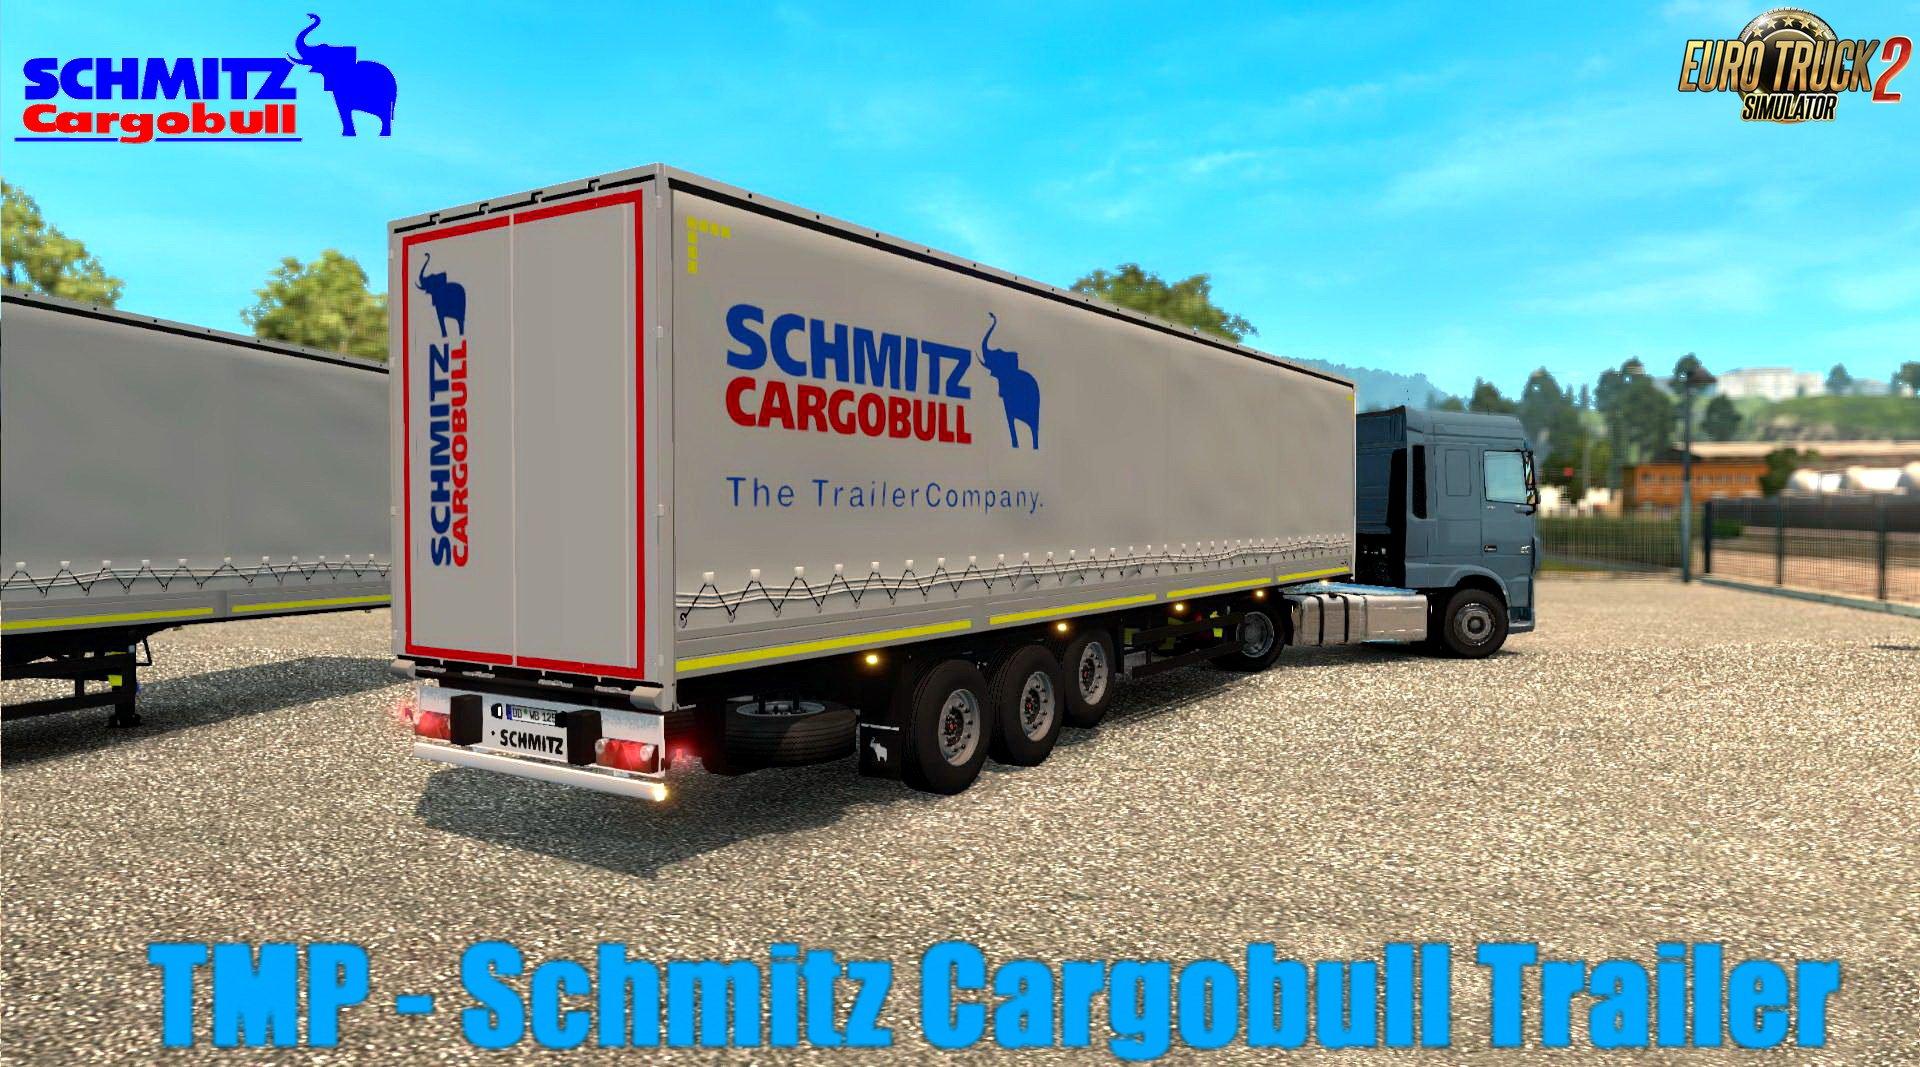 TMP - Schmitz Cargobull Trailer v1.2 by satan19990 (1.30.x)